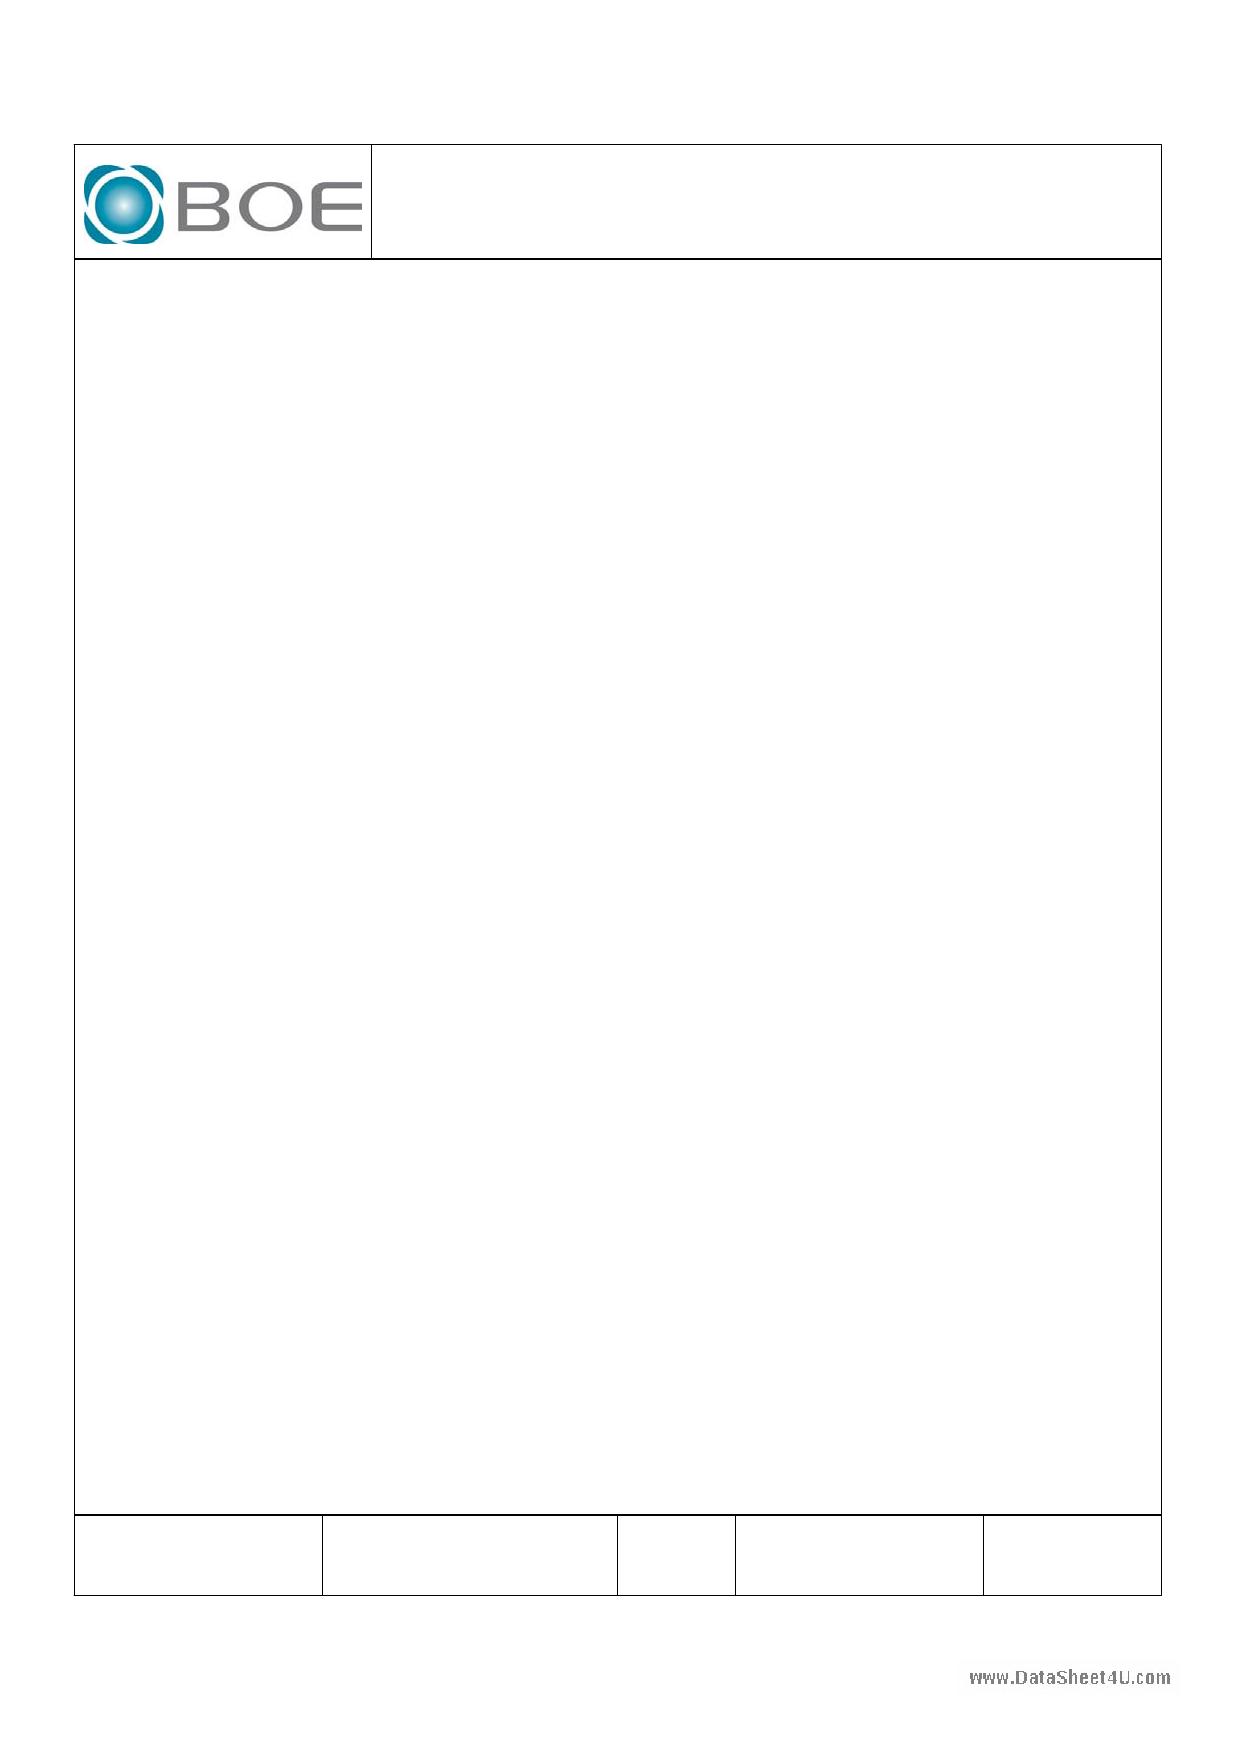 HV150UX1-101 Datasheet, HV150UX1-101 PDF,ピン配置, 機能